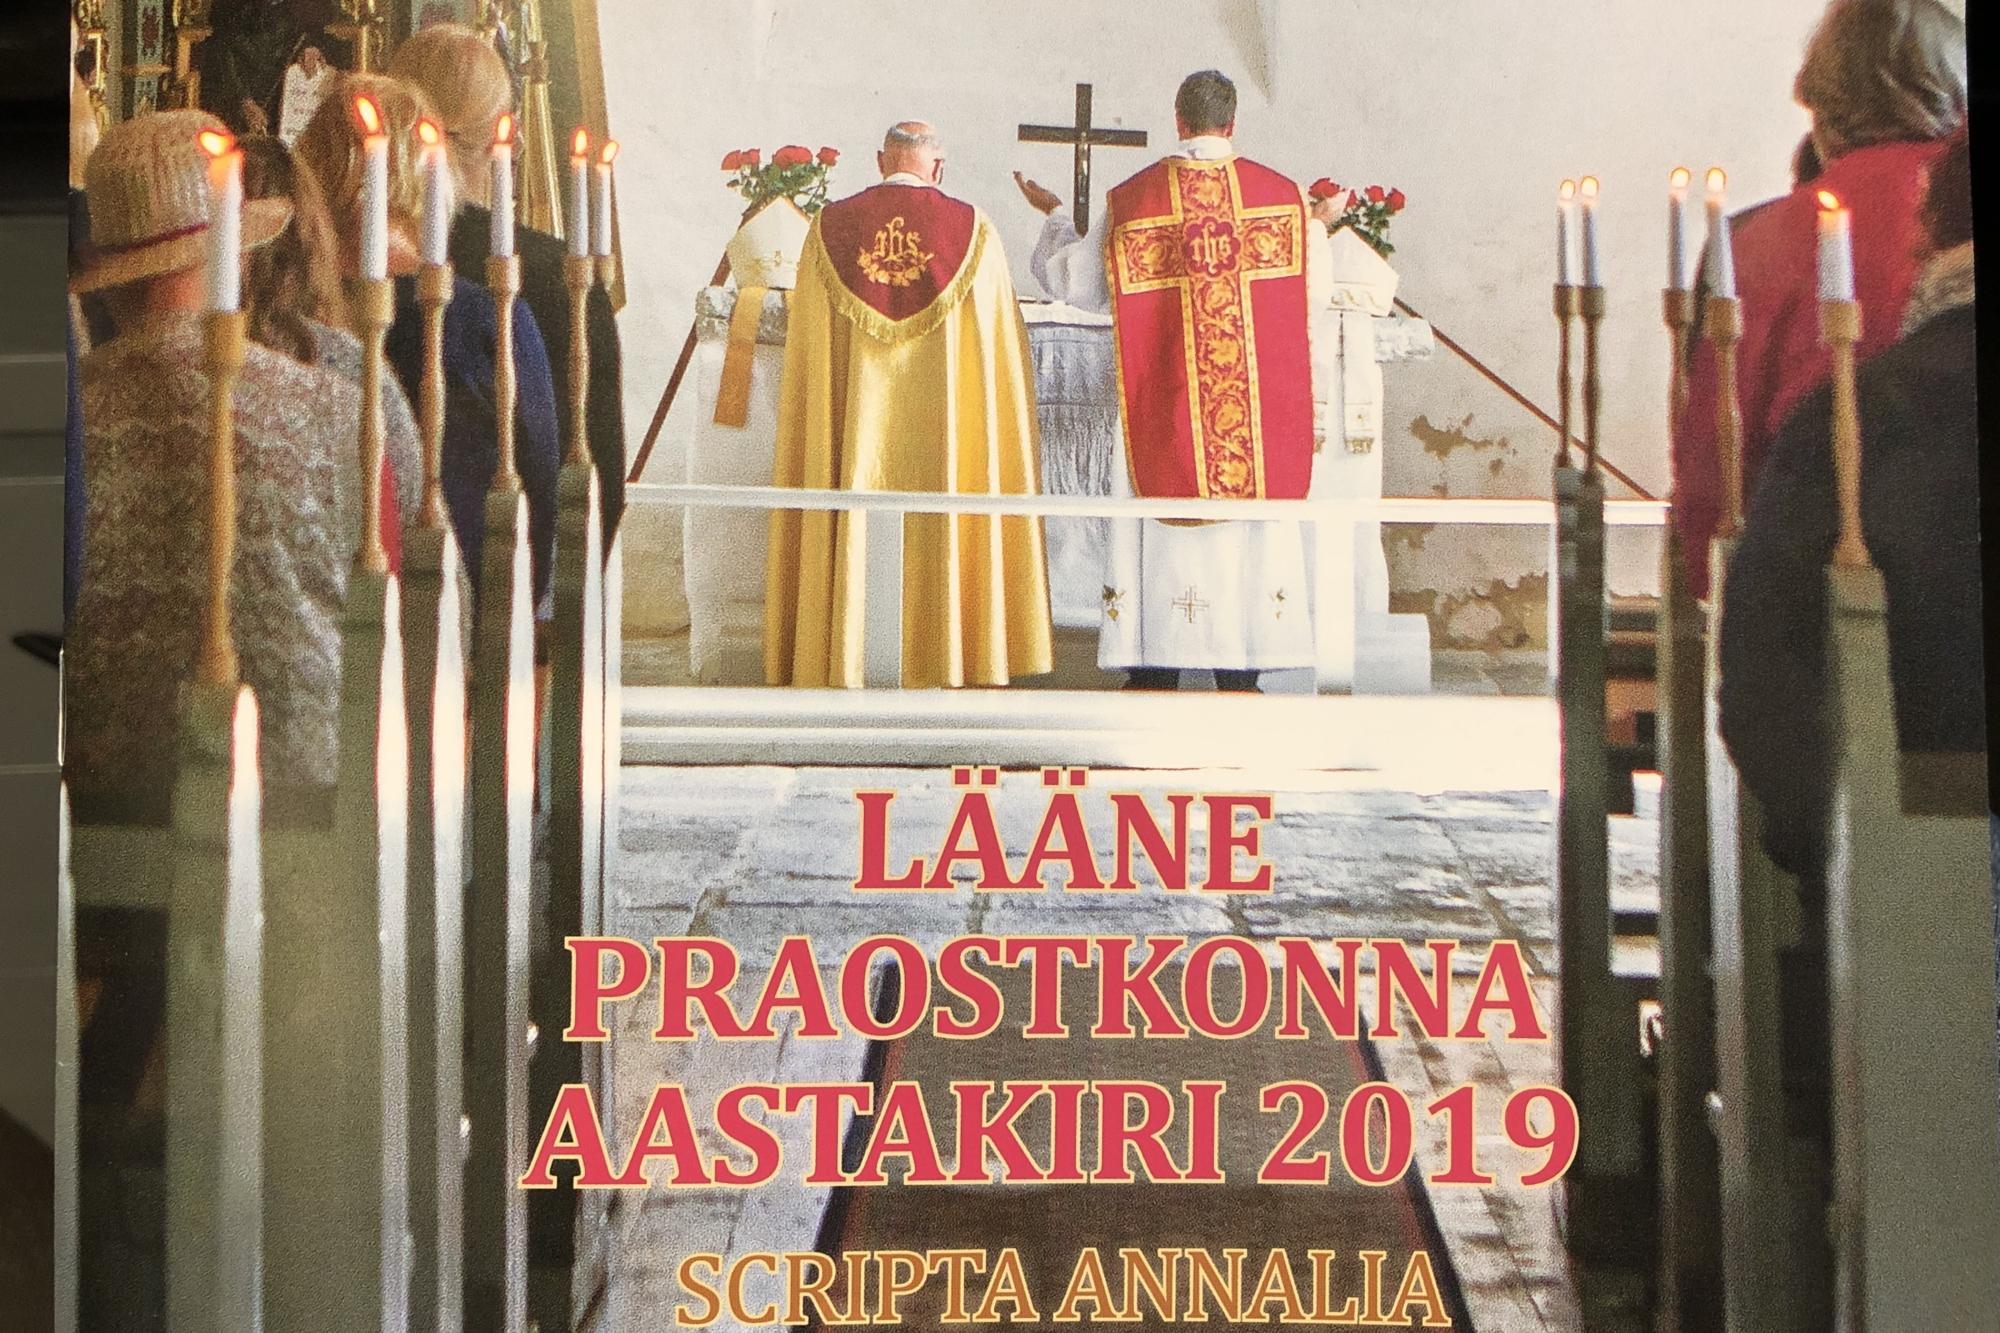 Ilmus Lääne praostkonna aastakiri Scripta Annalia